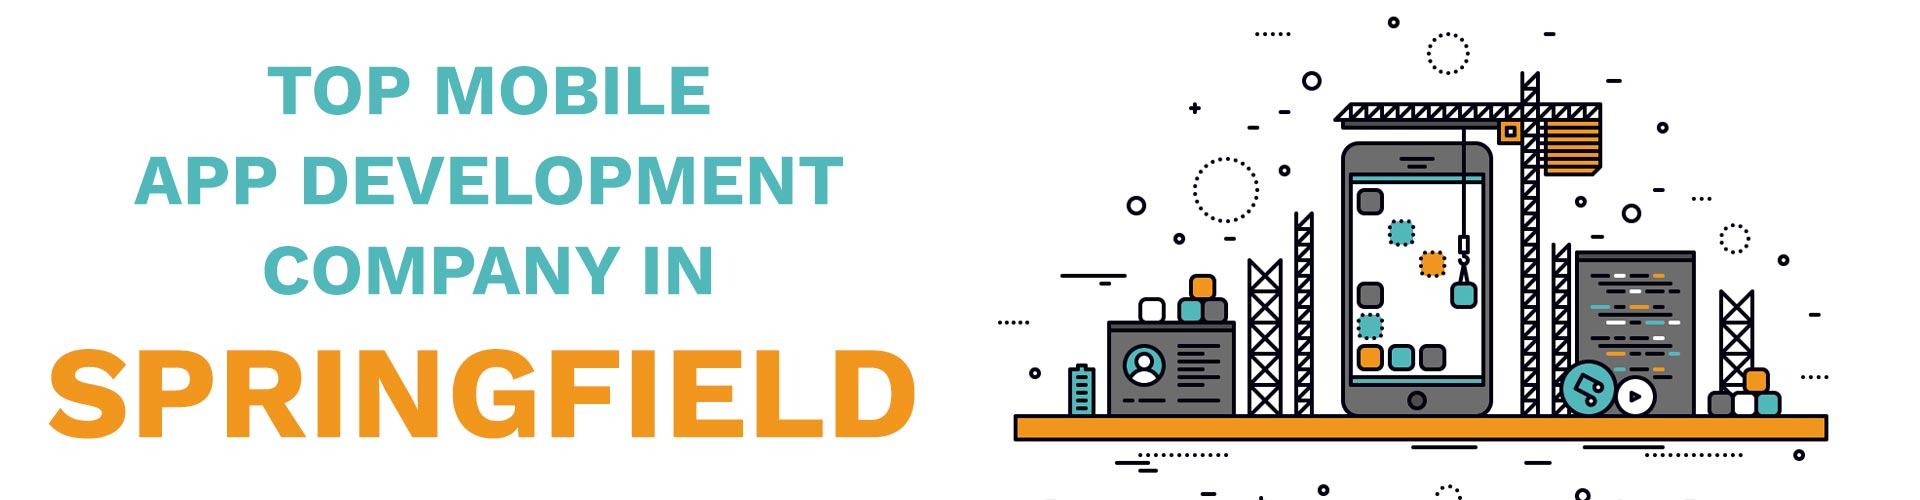 mobile app development company springfield